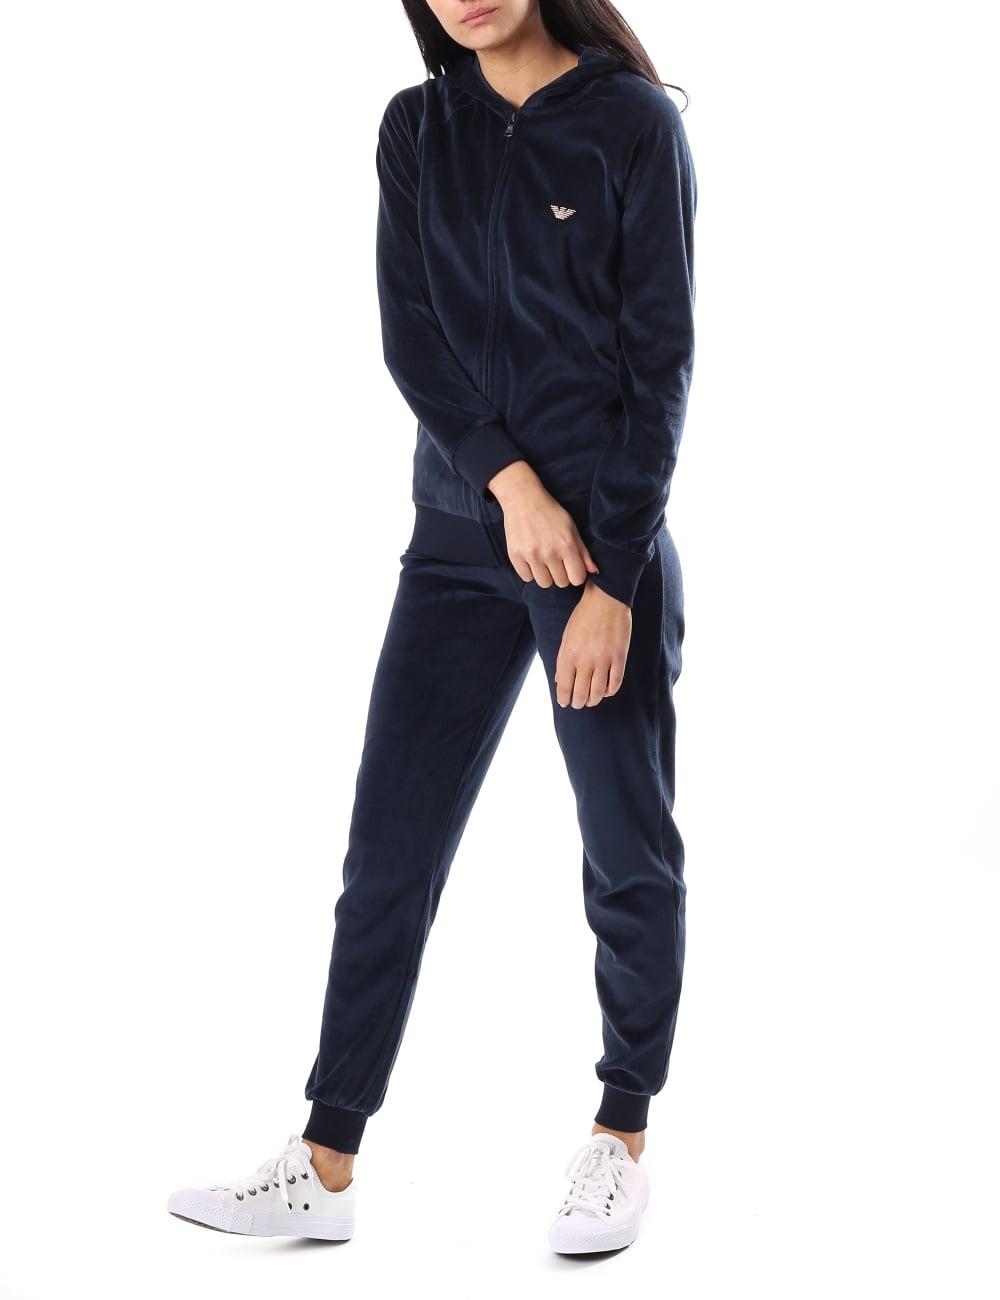 79c27f1217 Emporio Armani Women's Velour Zip Through Hooded Tracksuit